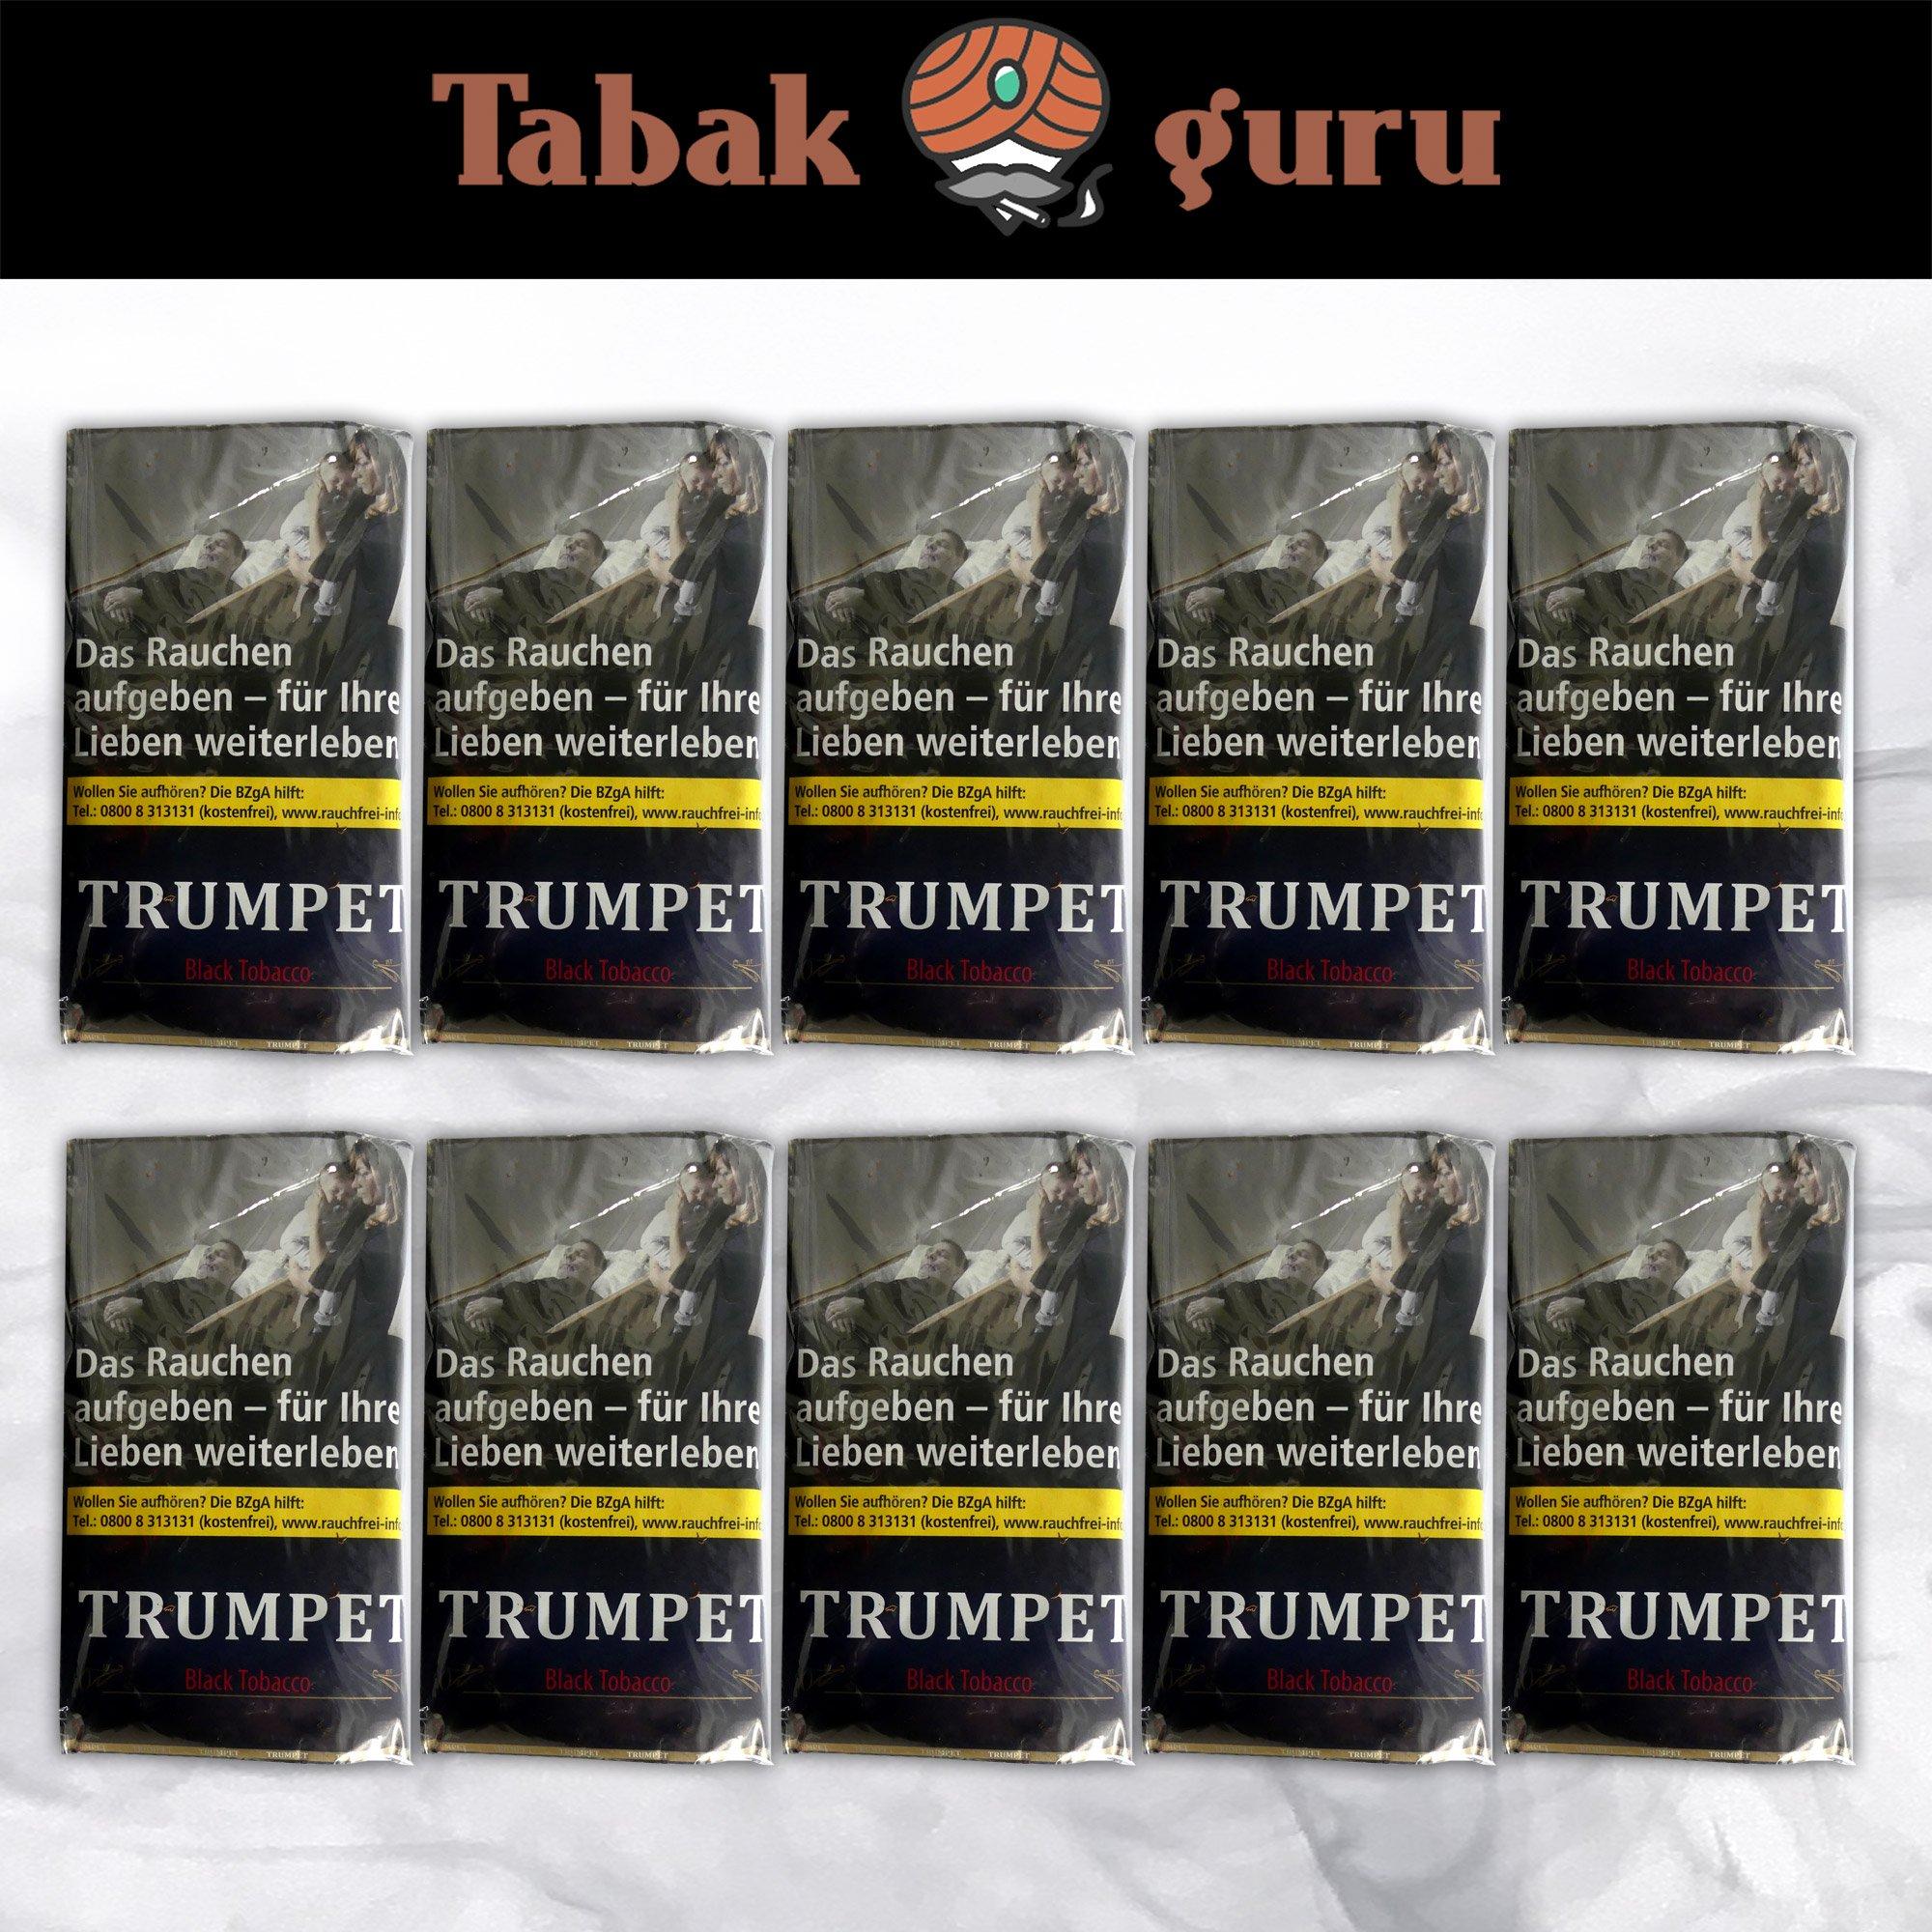 10 x Trumpet Black Tobacco Drehtabak à 38 g